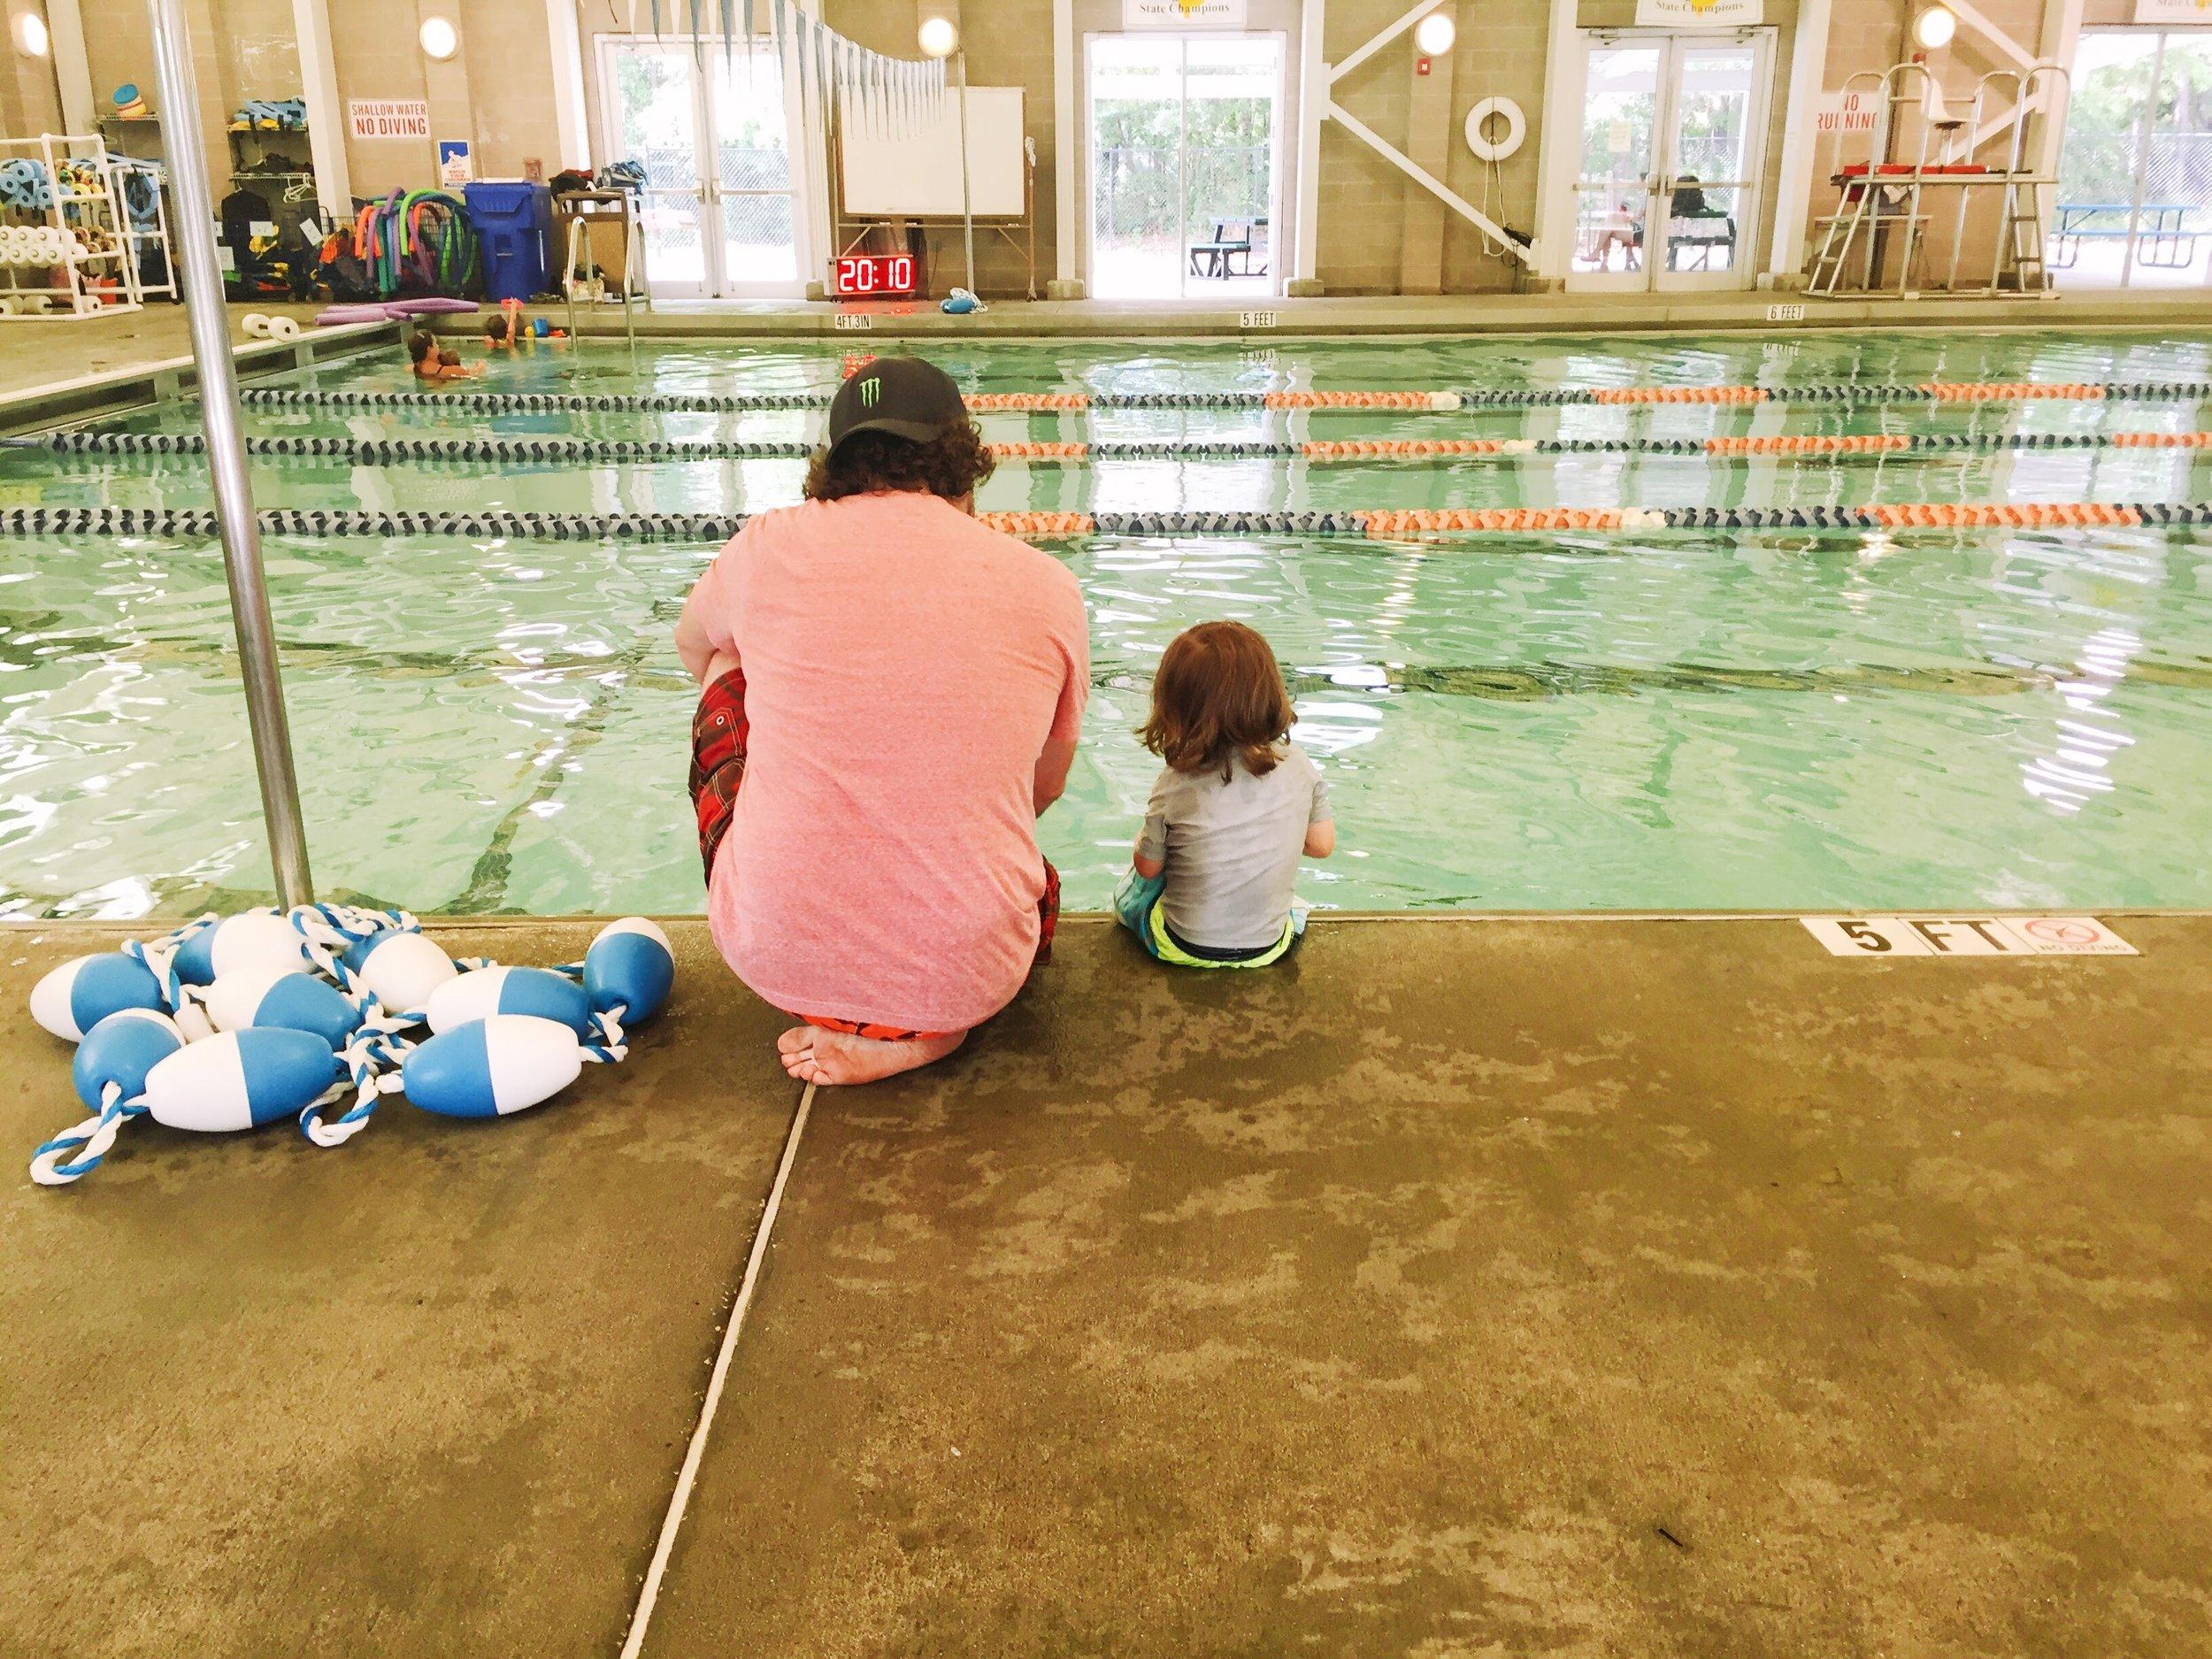 Just keep swimming, little b!